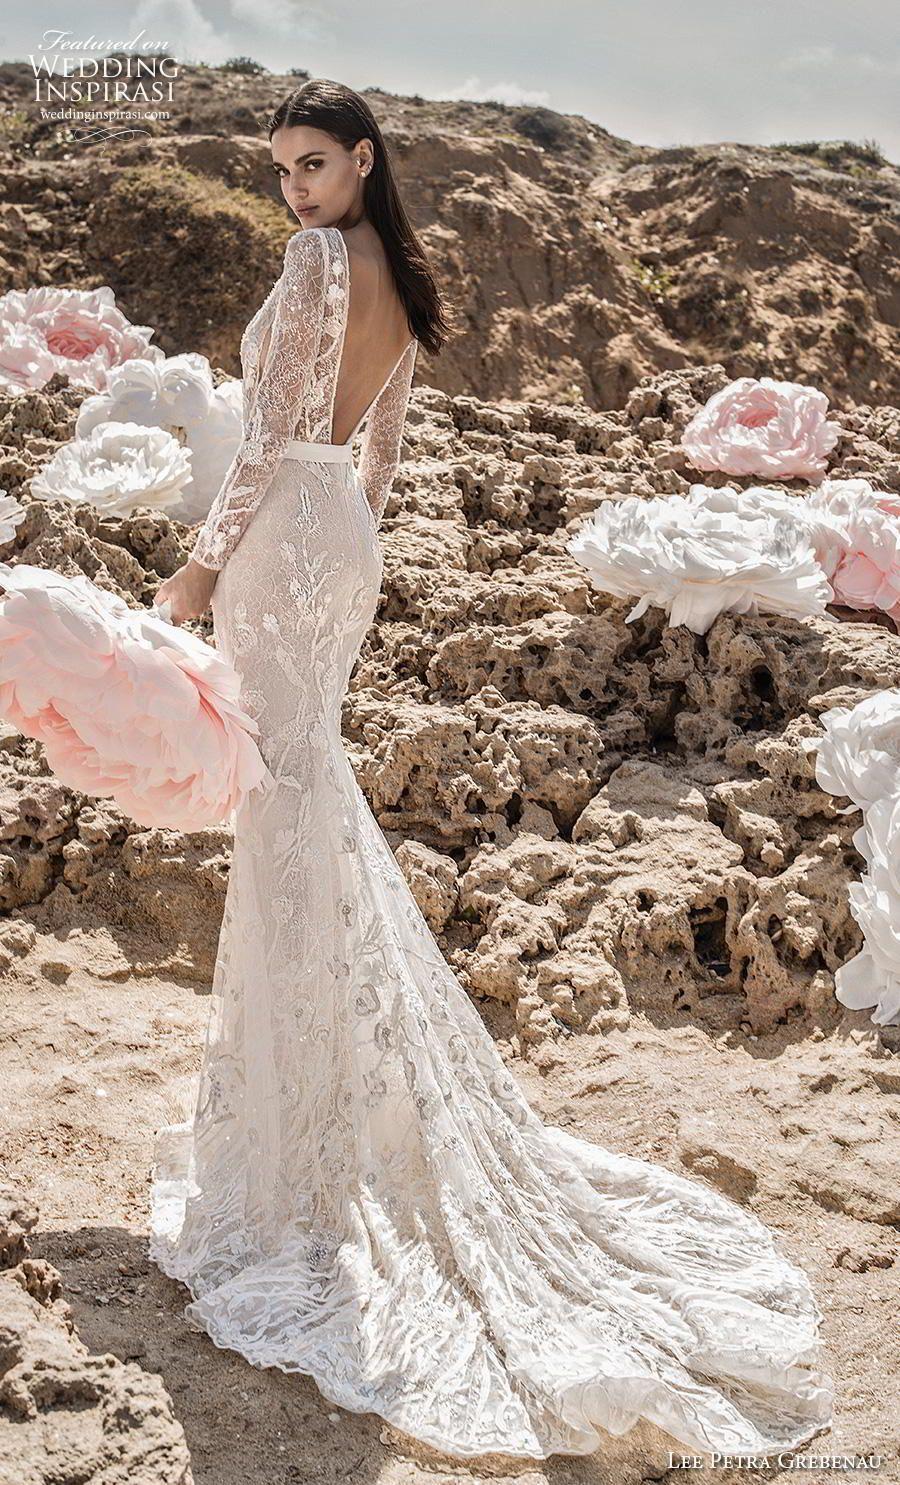 Lee Petra Grebenau 2019 Wedding Dresses Enchanted Blossom Bridal Collection Wedding Inspirasi Lace Wedding Dress With Sleeves Wedding Dress Guide Wedding Dress Long Sleeve [ 1485 x 900 Pixel ]